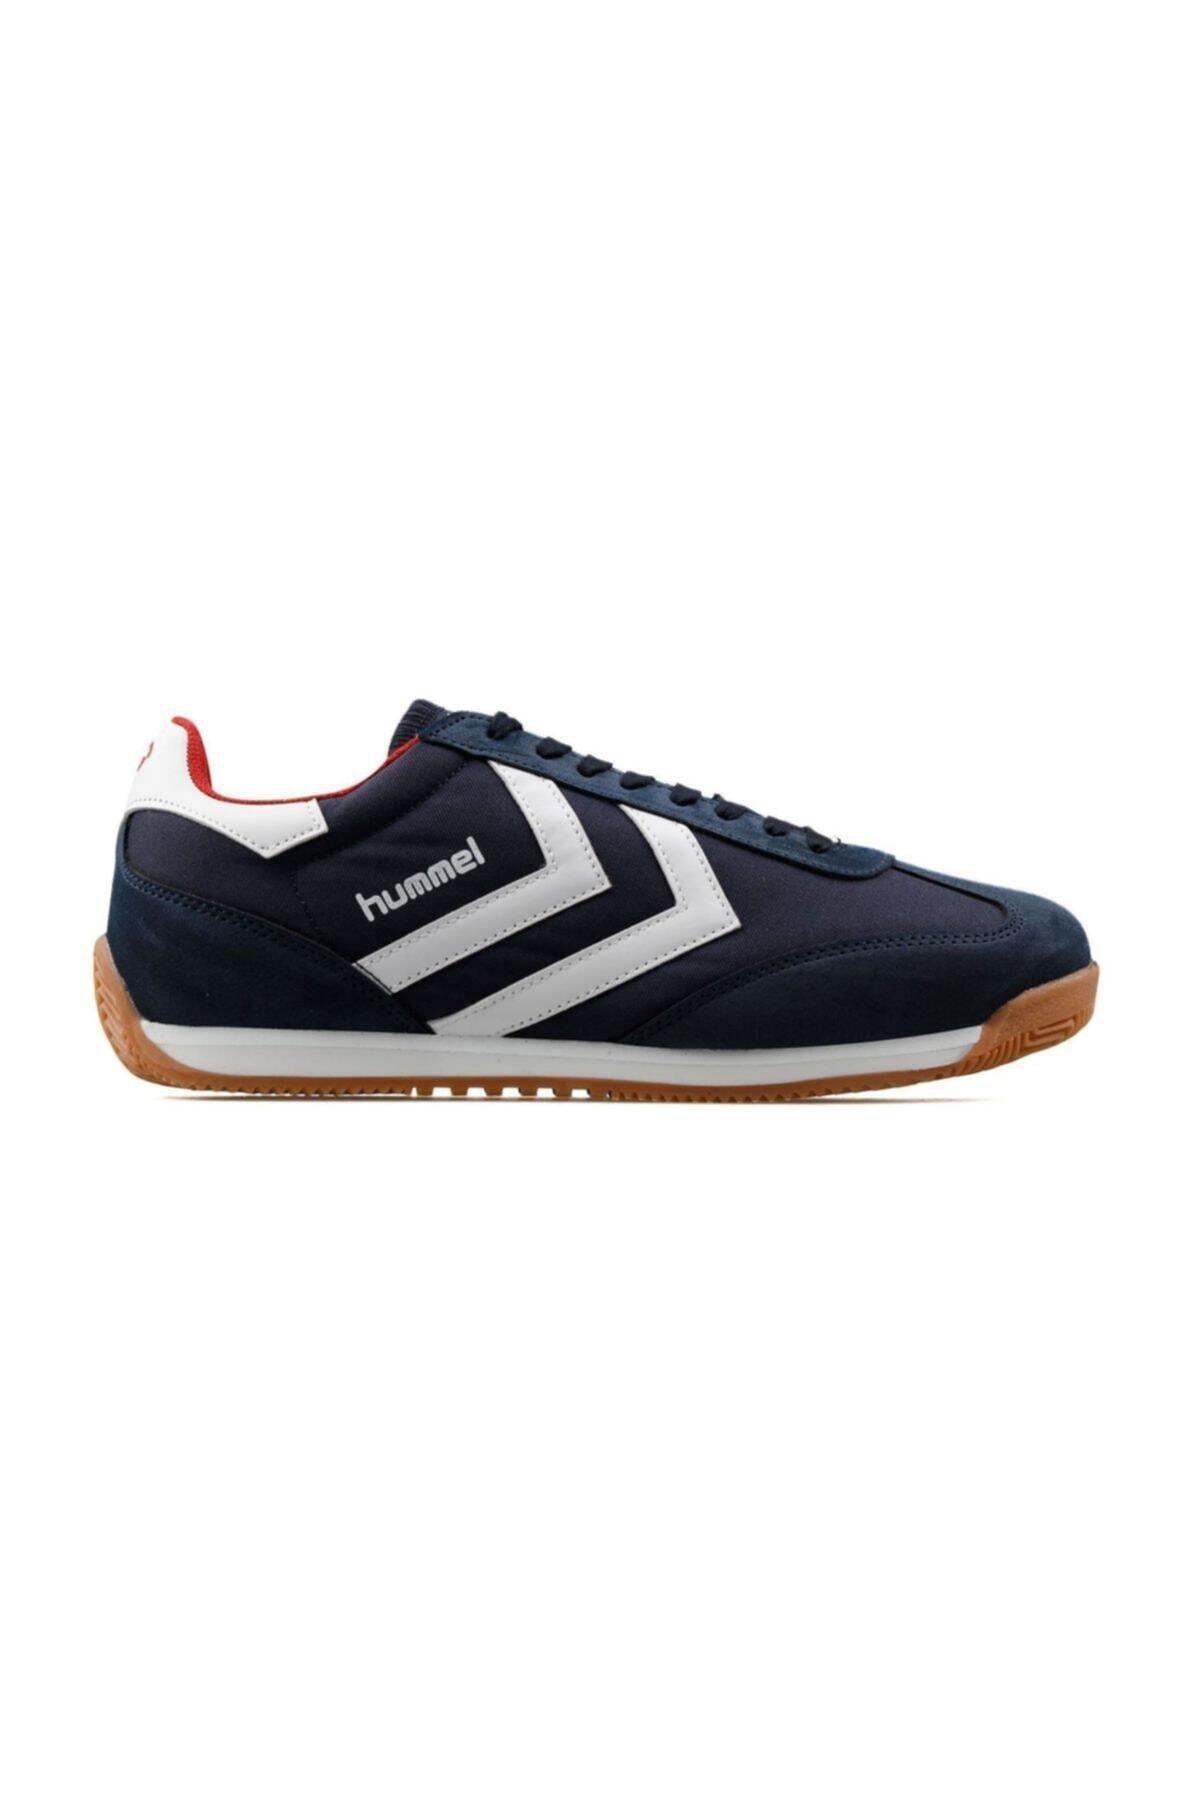 HUMMEL STADION III LIFESTYLE SHO Lacivert Erkek Sneaker Ayakkabı 100584578 1